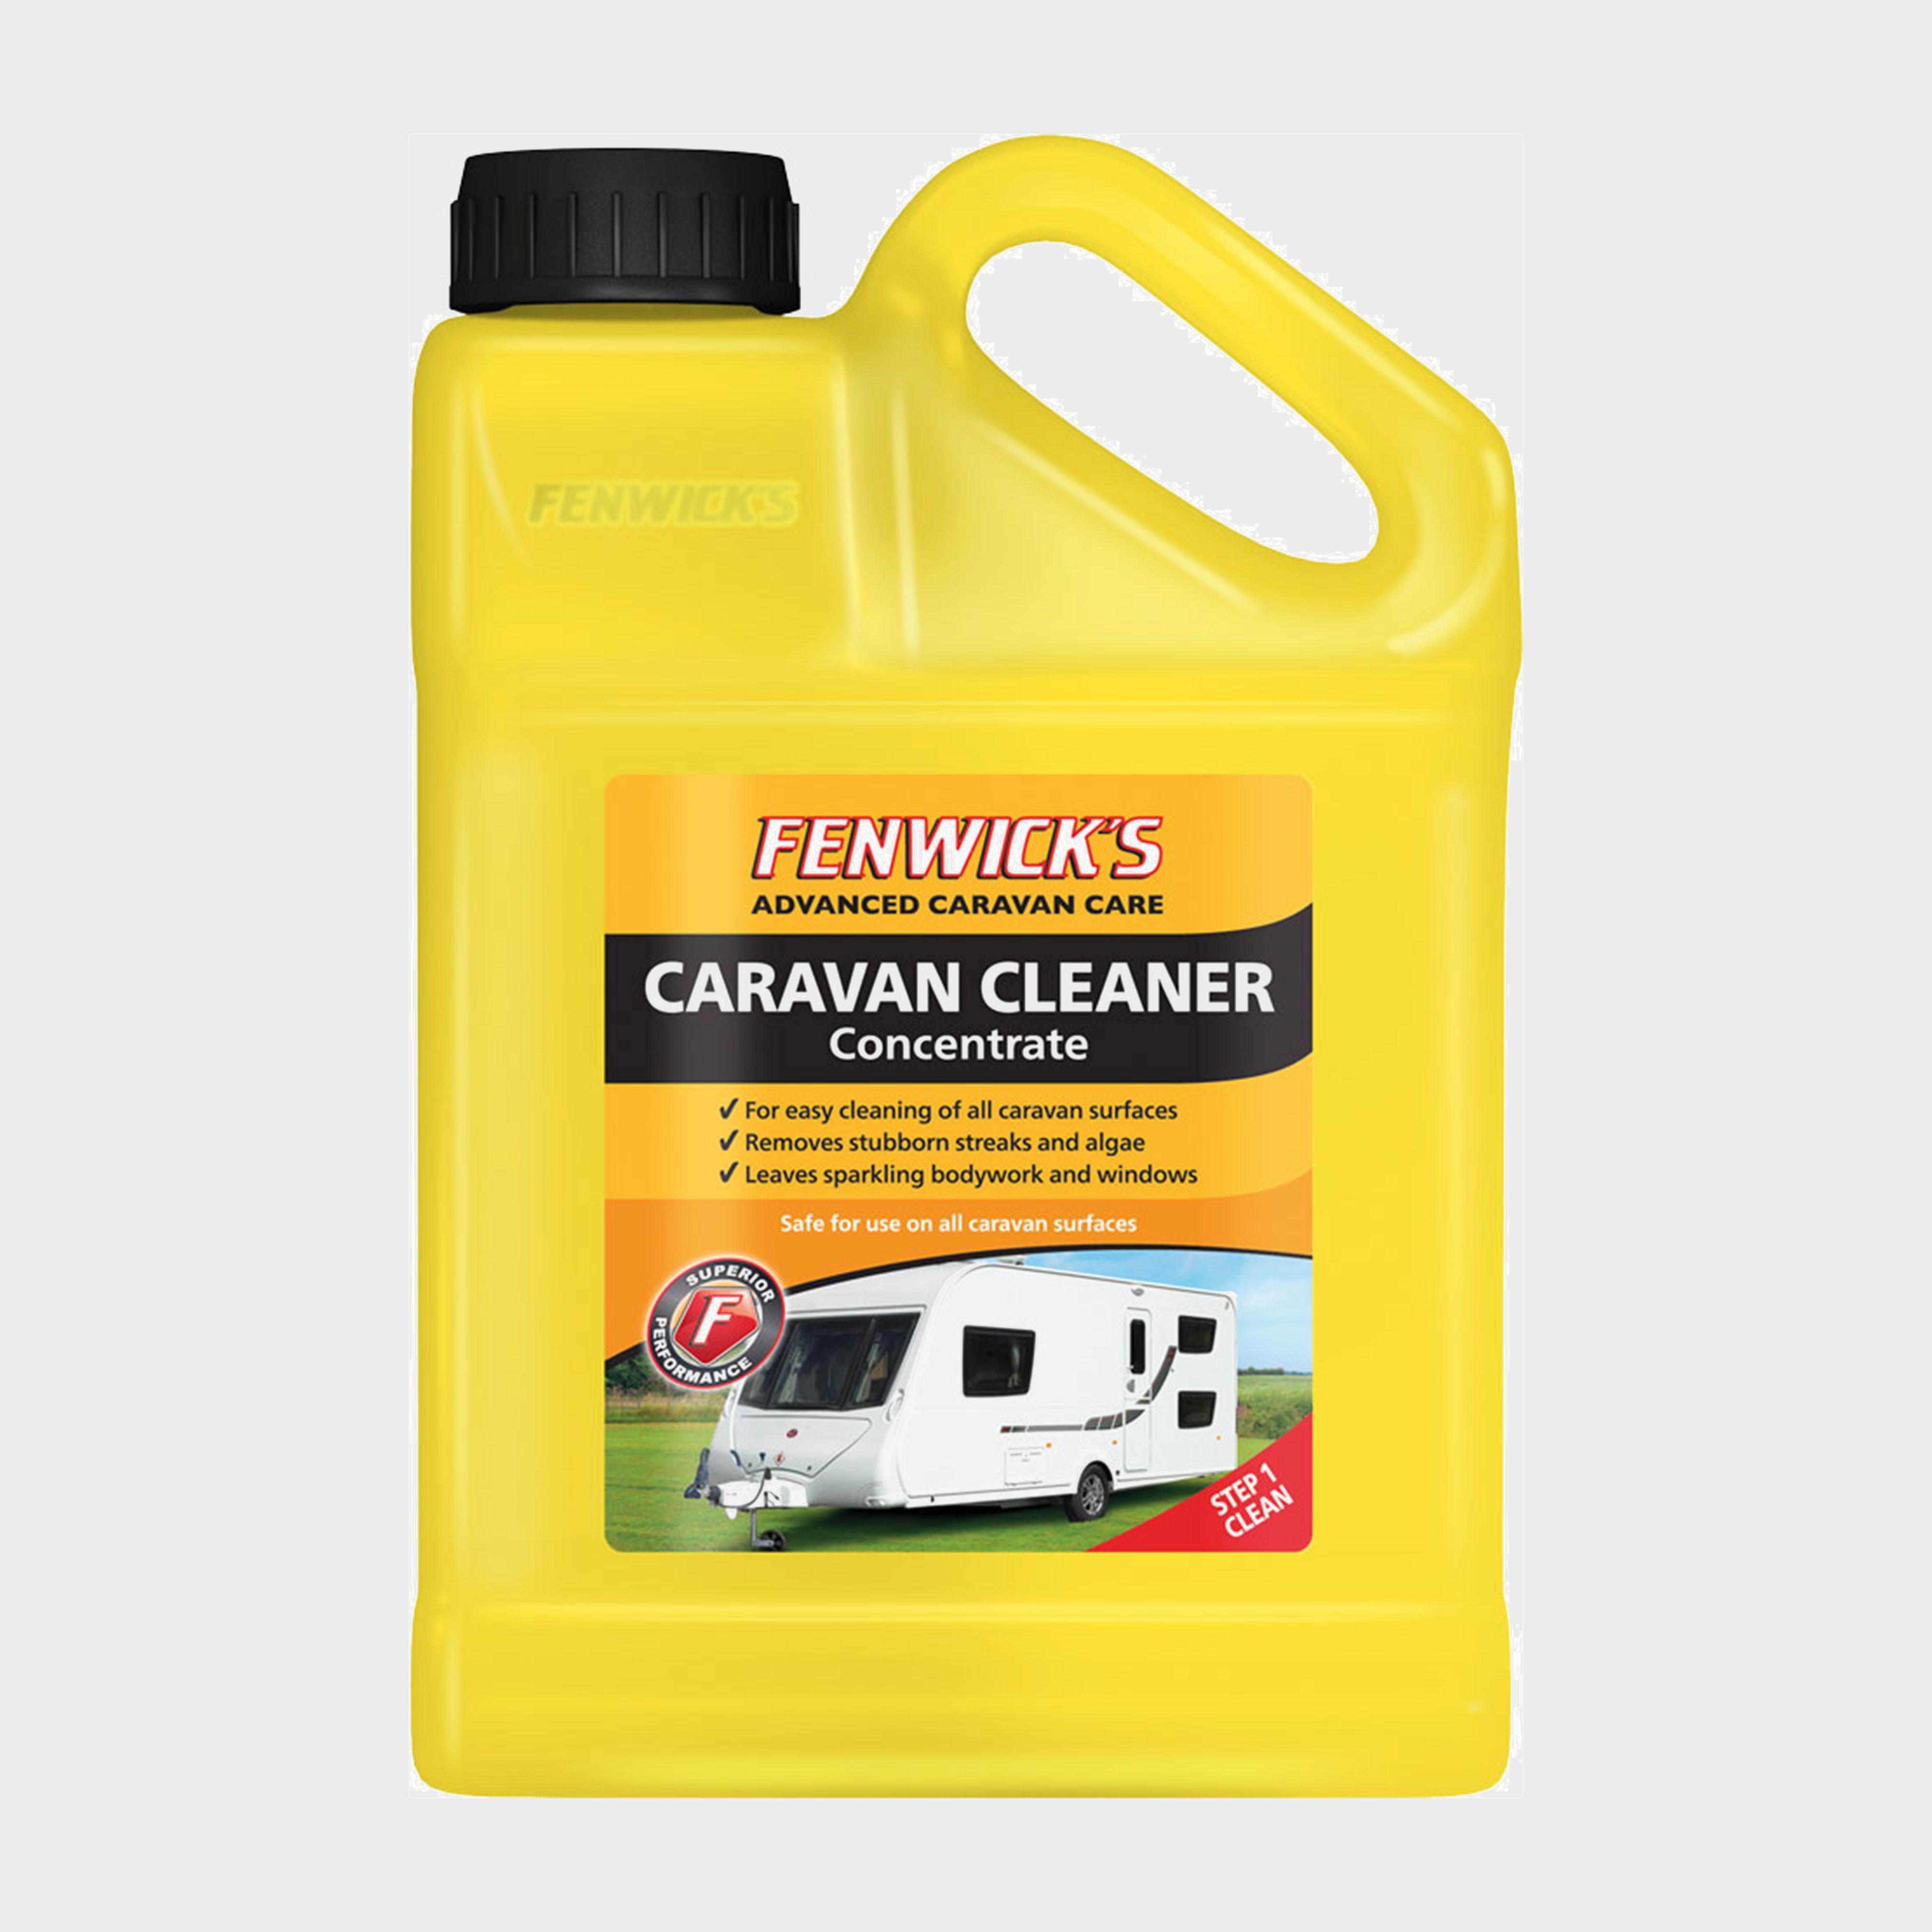 Fenwicks Fenwicks Caravan Cleaner Concentrate (1 Litre) - Yellow, Yellow